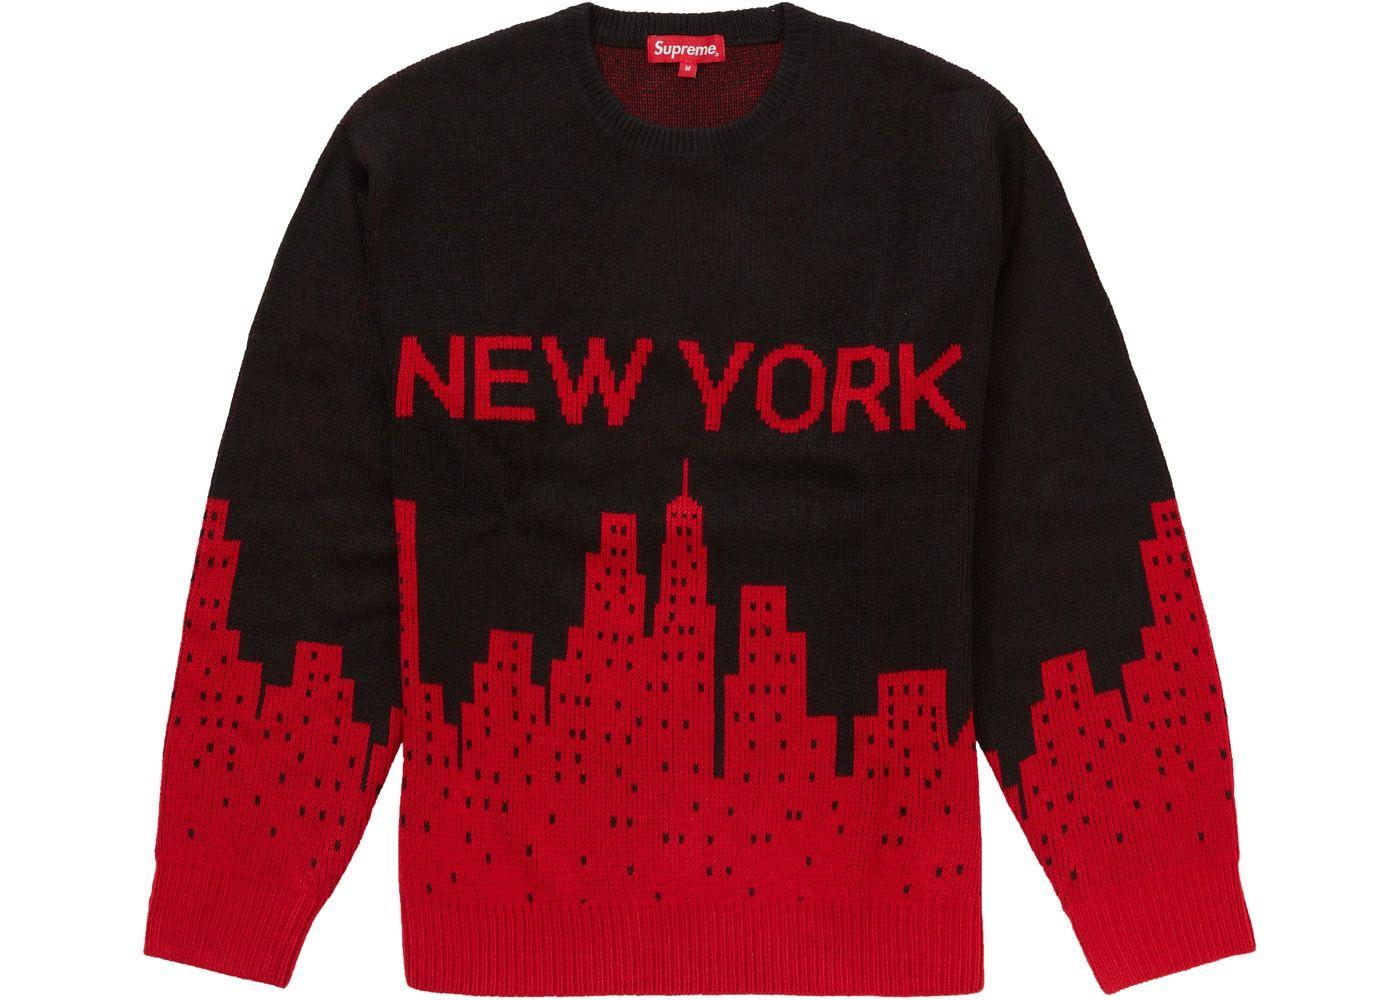 Supreme New York Sweater Black In 2021 New York Sweatshirt Sweaters Supreme Sweater [ 1000 x 1400 Pixel ]